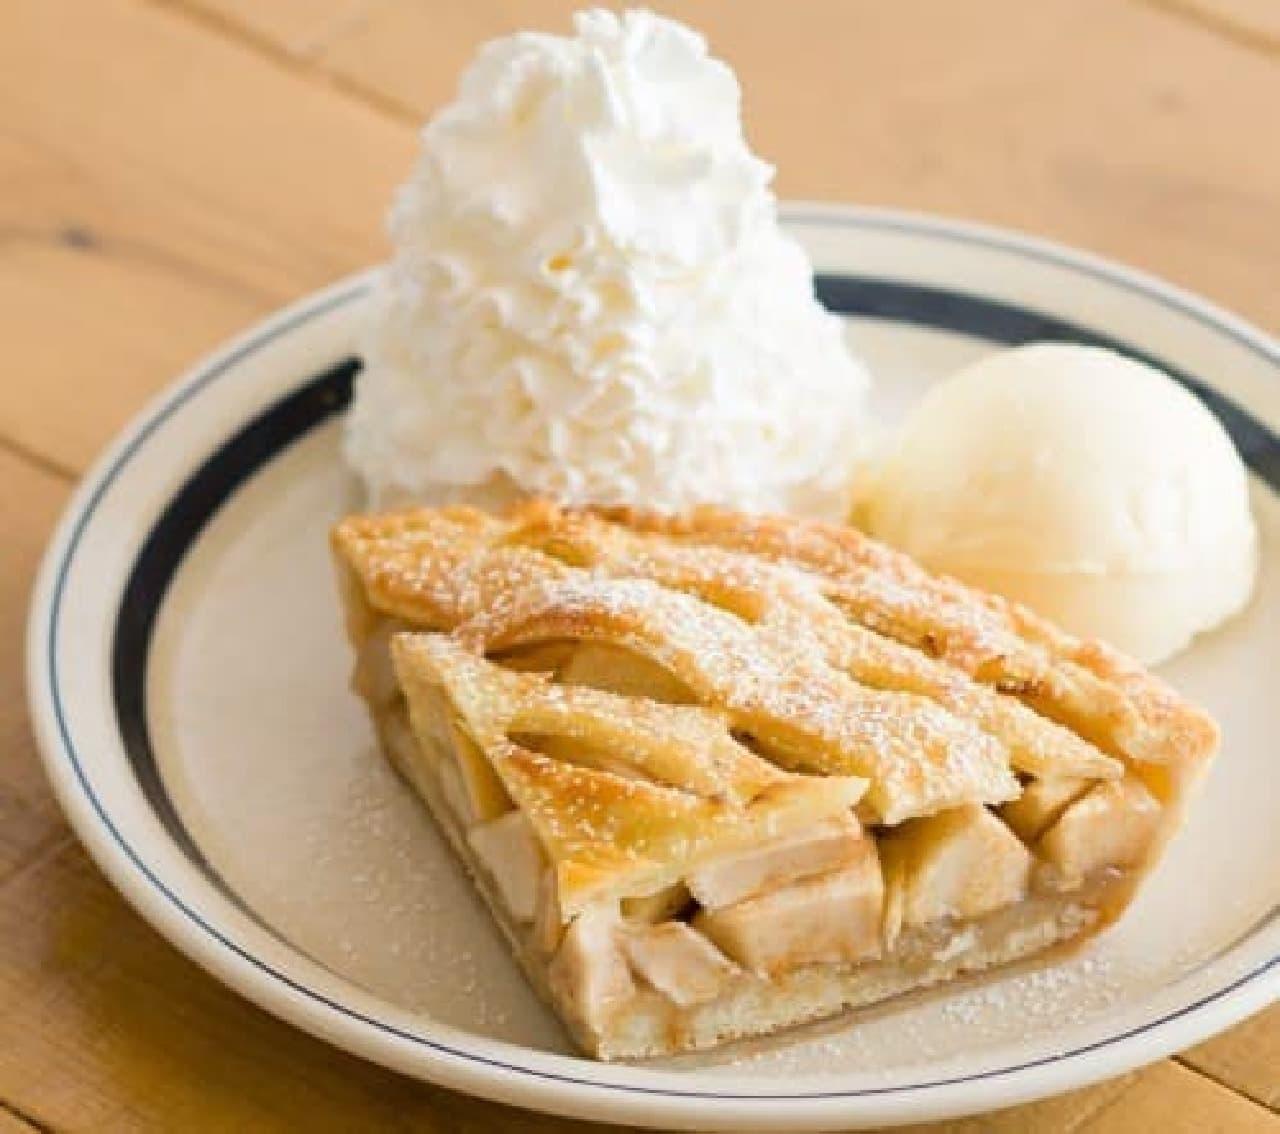 Eggs'n Things(エッグスンシングス)梅田茶屋町店限定、パンケーキ生地を使った「ホームメイドアップルパイ」